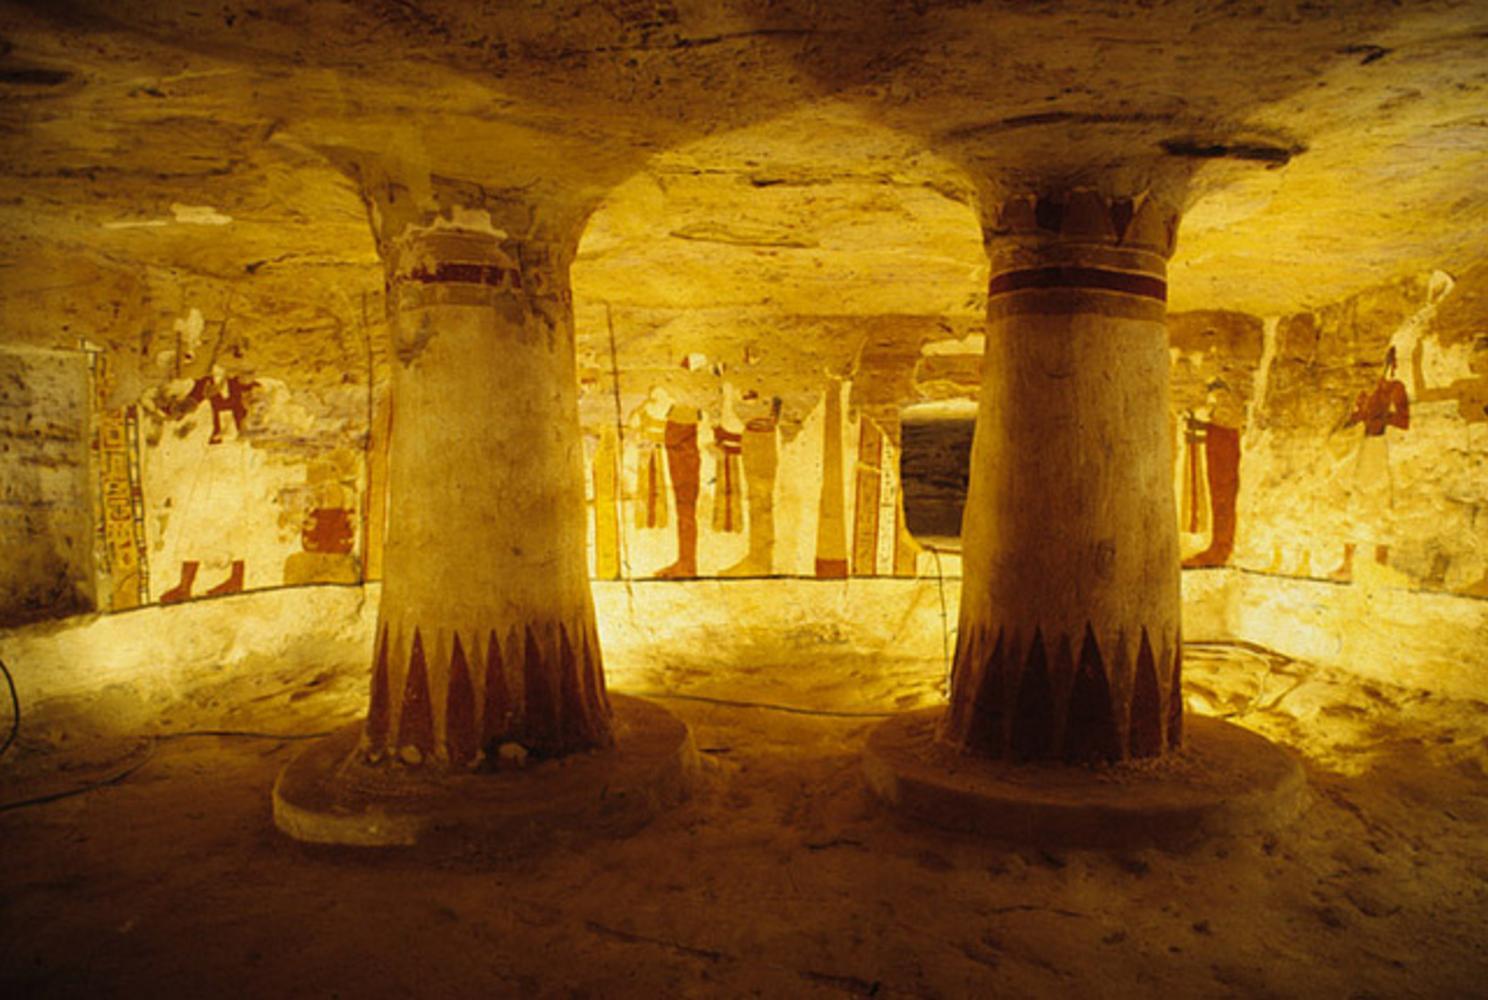 Valley of the Golden Mummies, Egypt